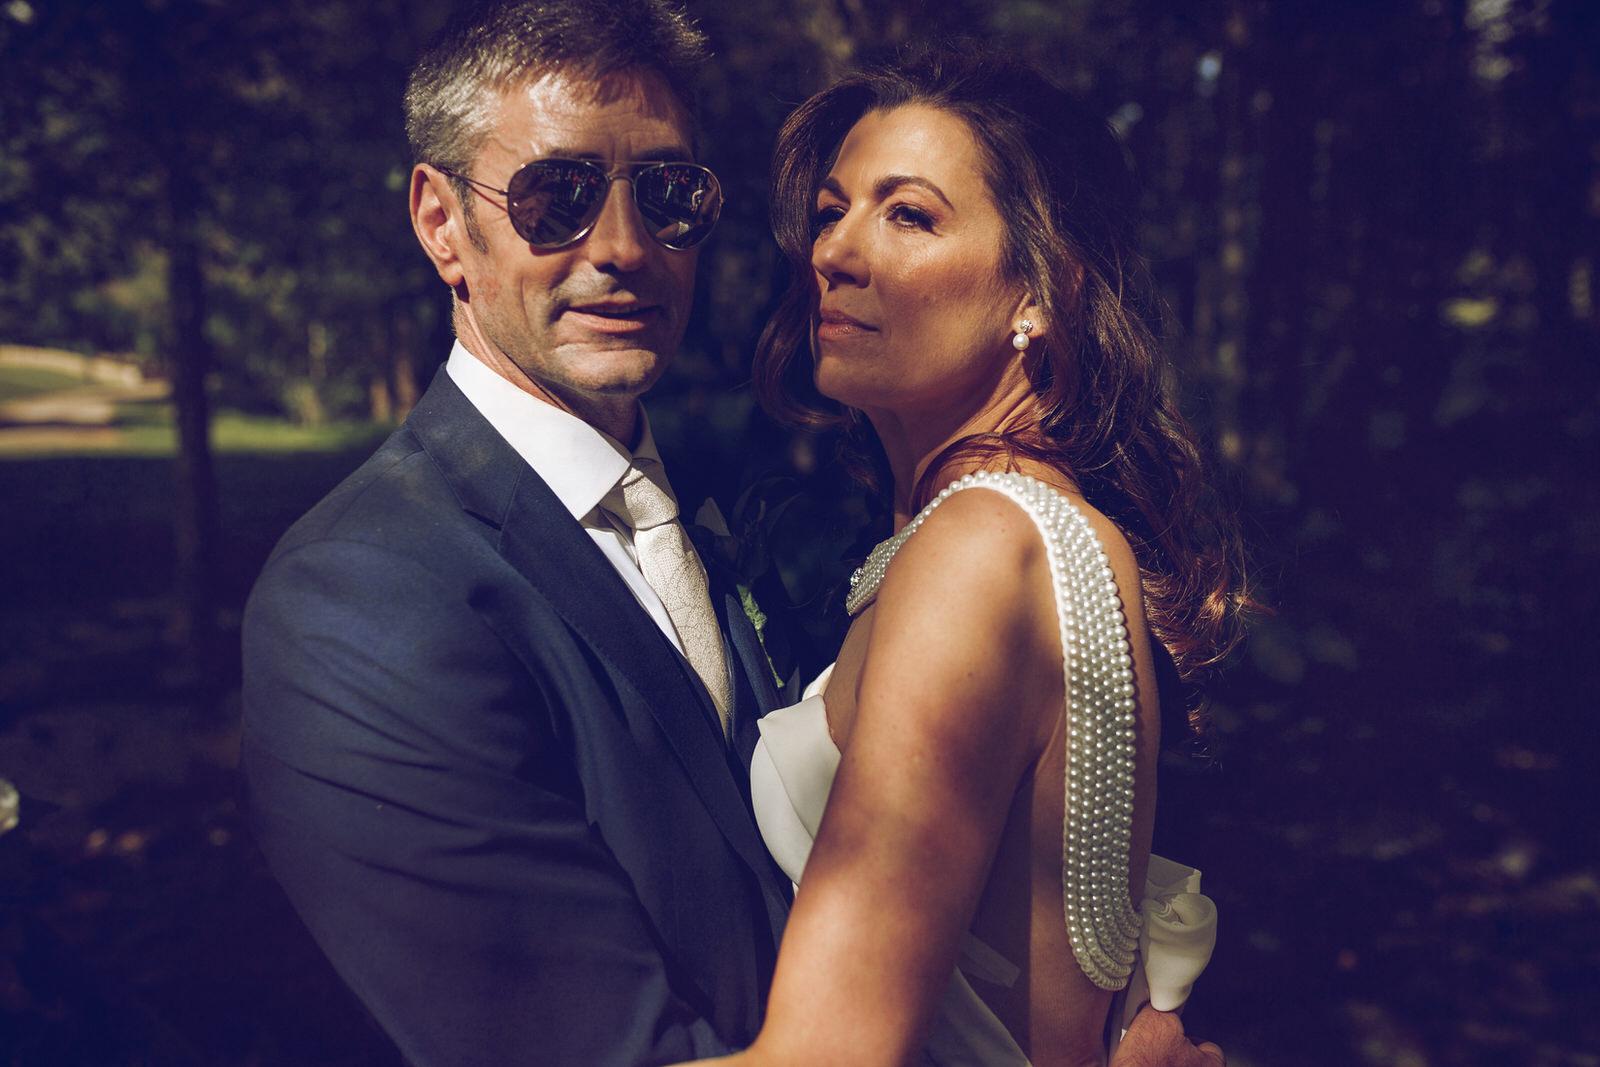 Brooklodge-wicklow-wedding-photographer_100.jpg